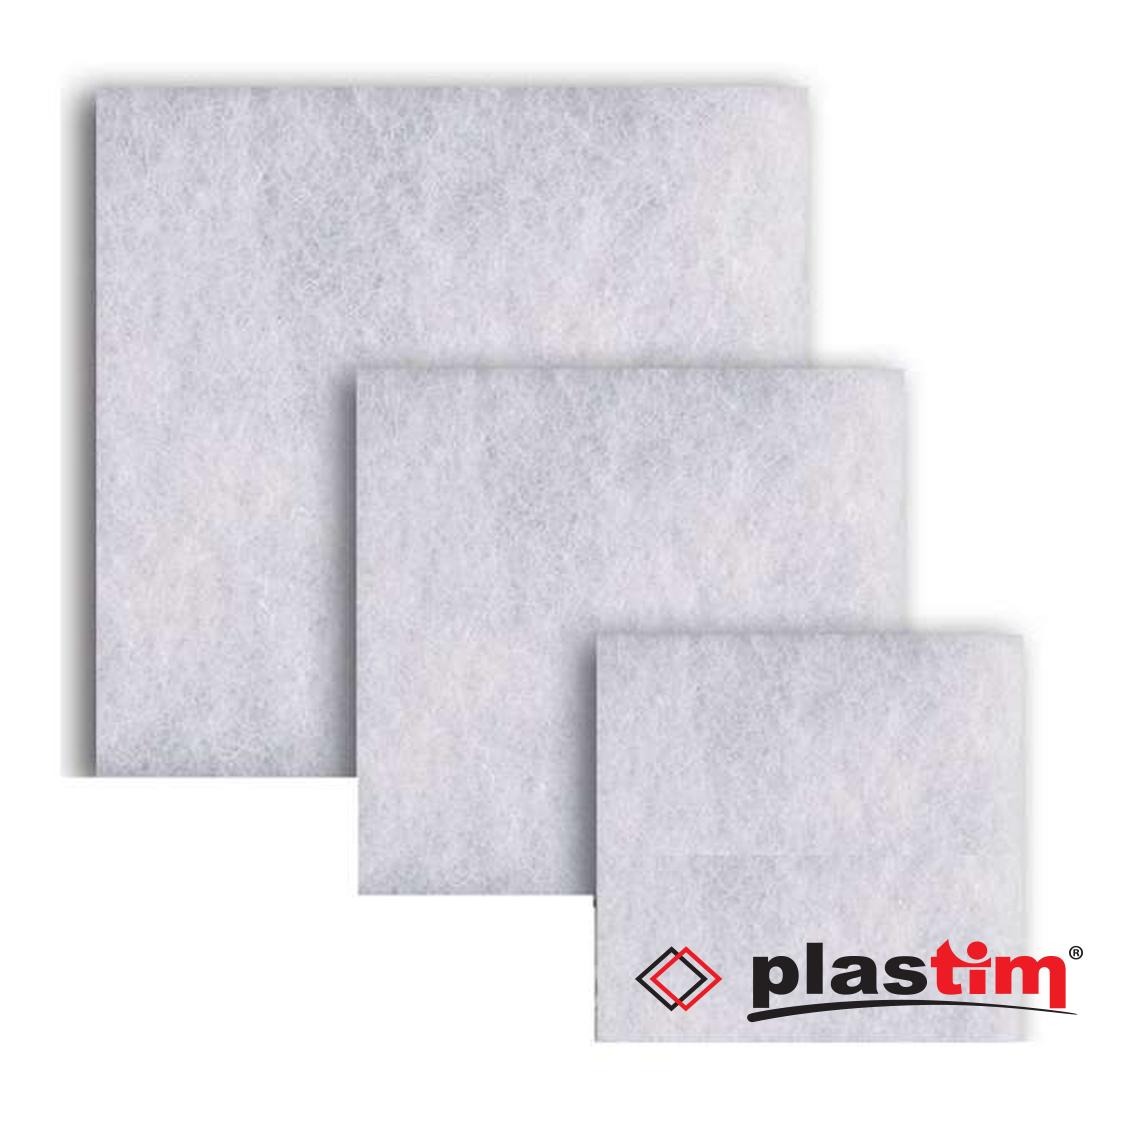 Filter za ventilator 325x325mm Plastim Elektro Vukojevic